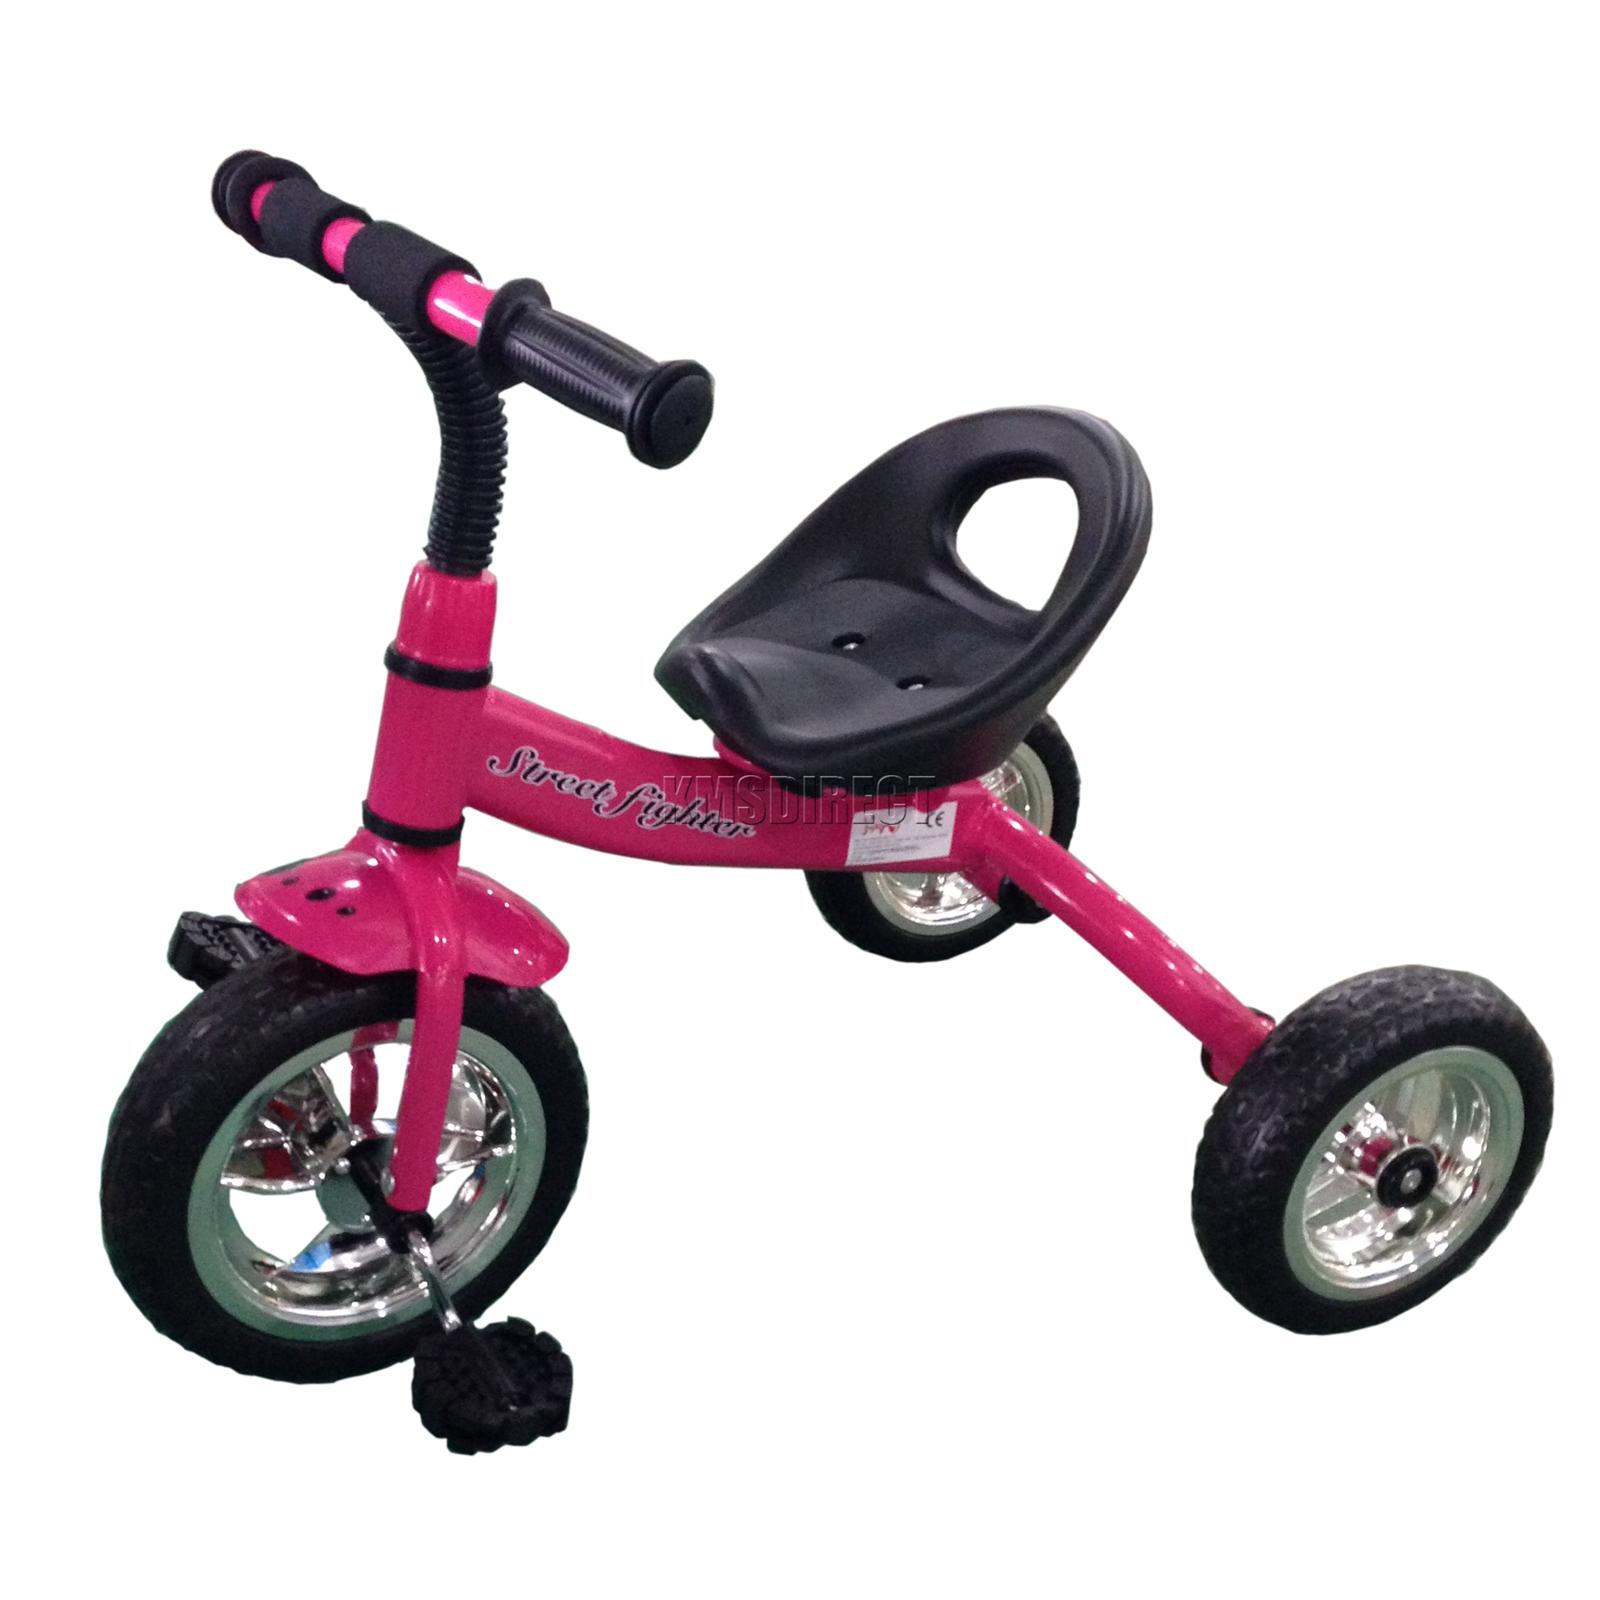 foxhunter pink child children kids trike tricycle 3 wheel. Black Bedroom Furniture Sets. Home Design Ideas